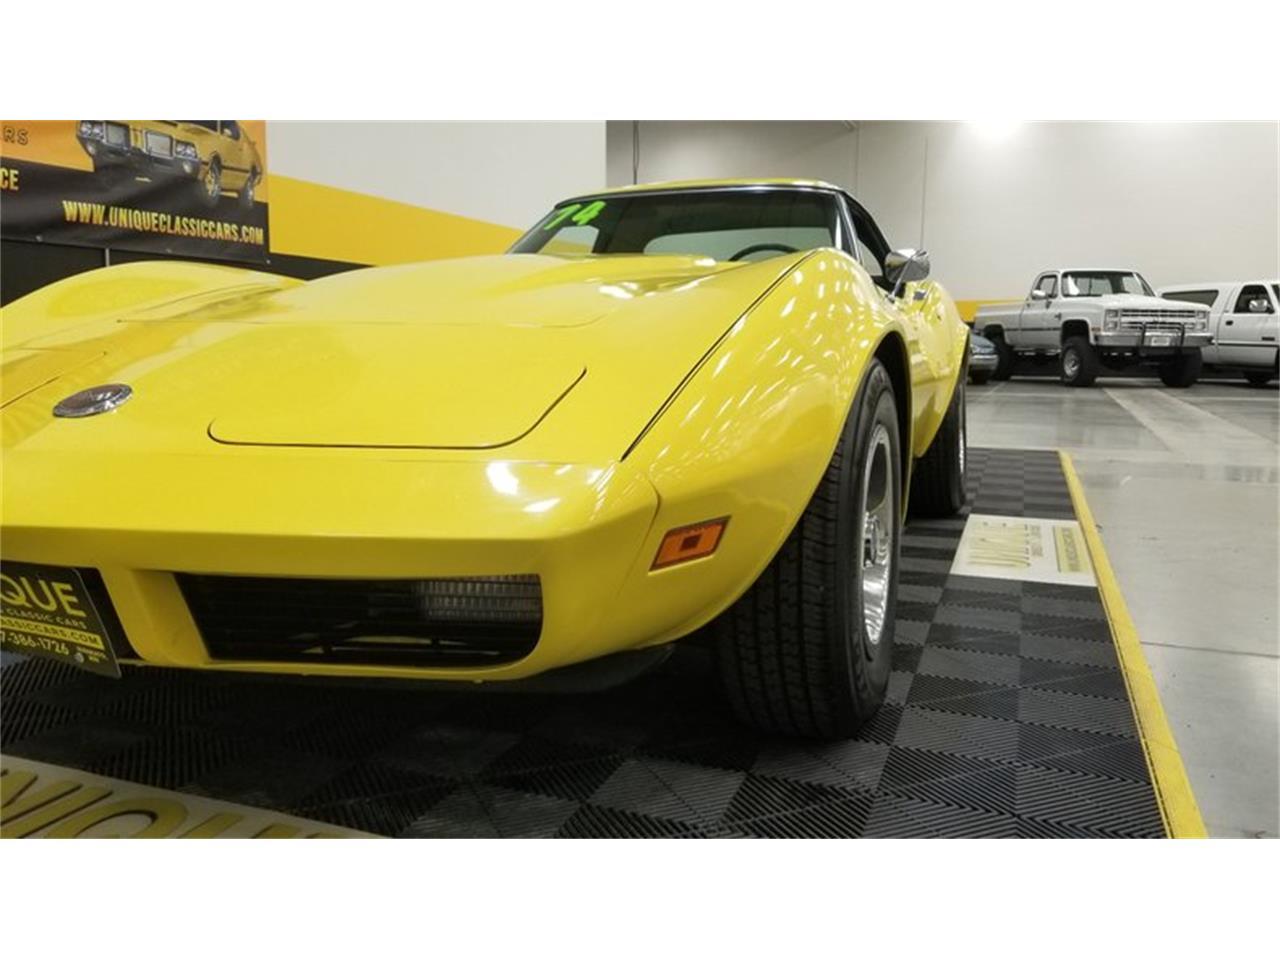 1974 Chevrolet Corvette (CC-1364120) for sale in Mankato, Minnesota